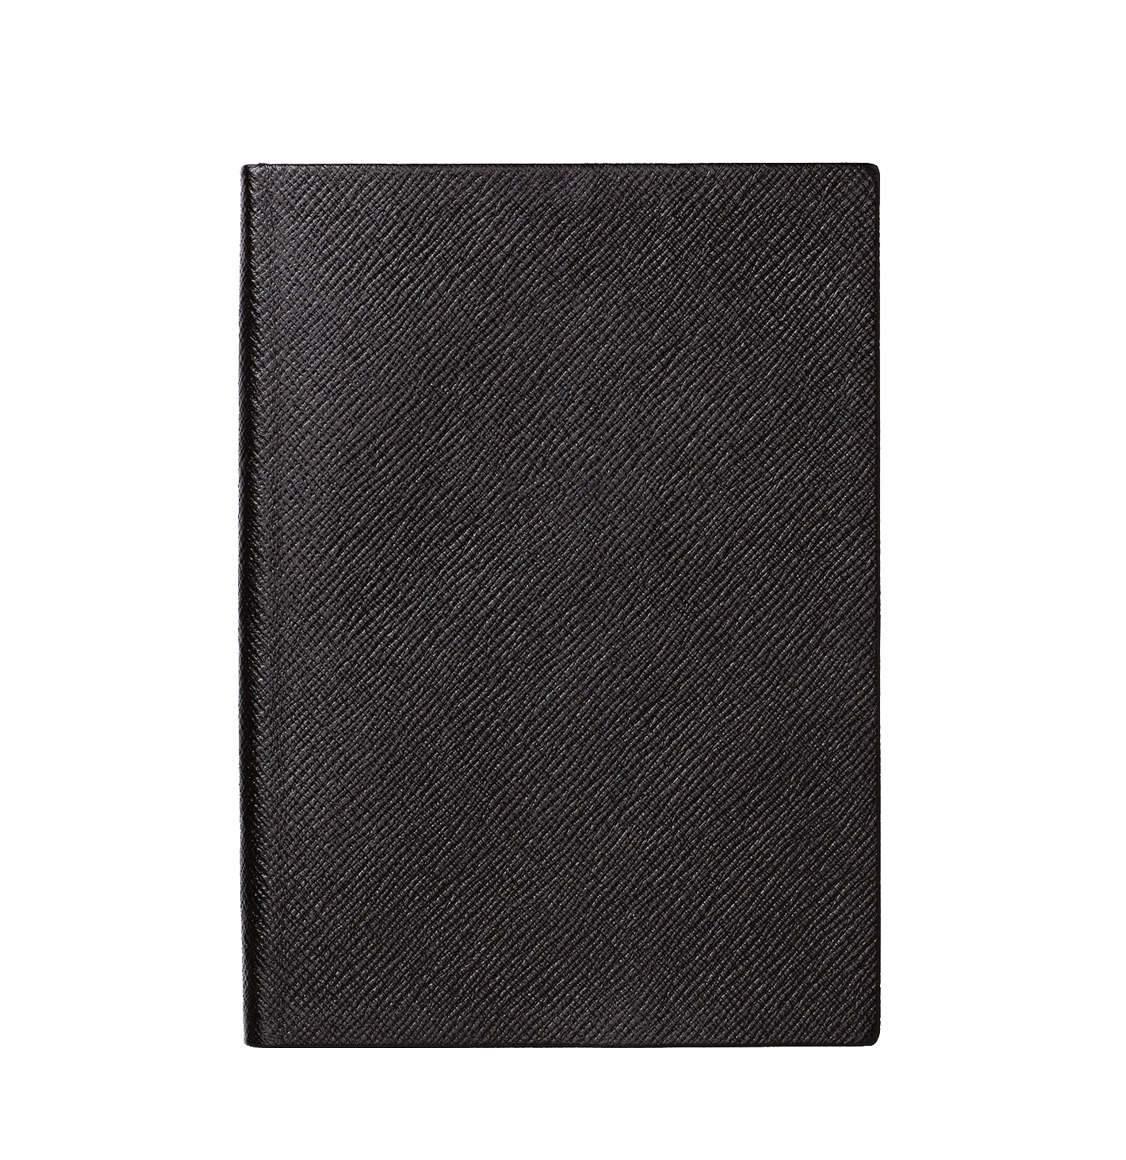 Smythson Panama Cross-Grain Leather Soho Notebook